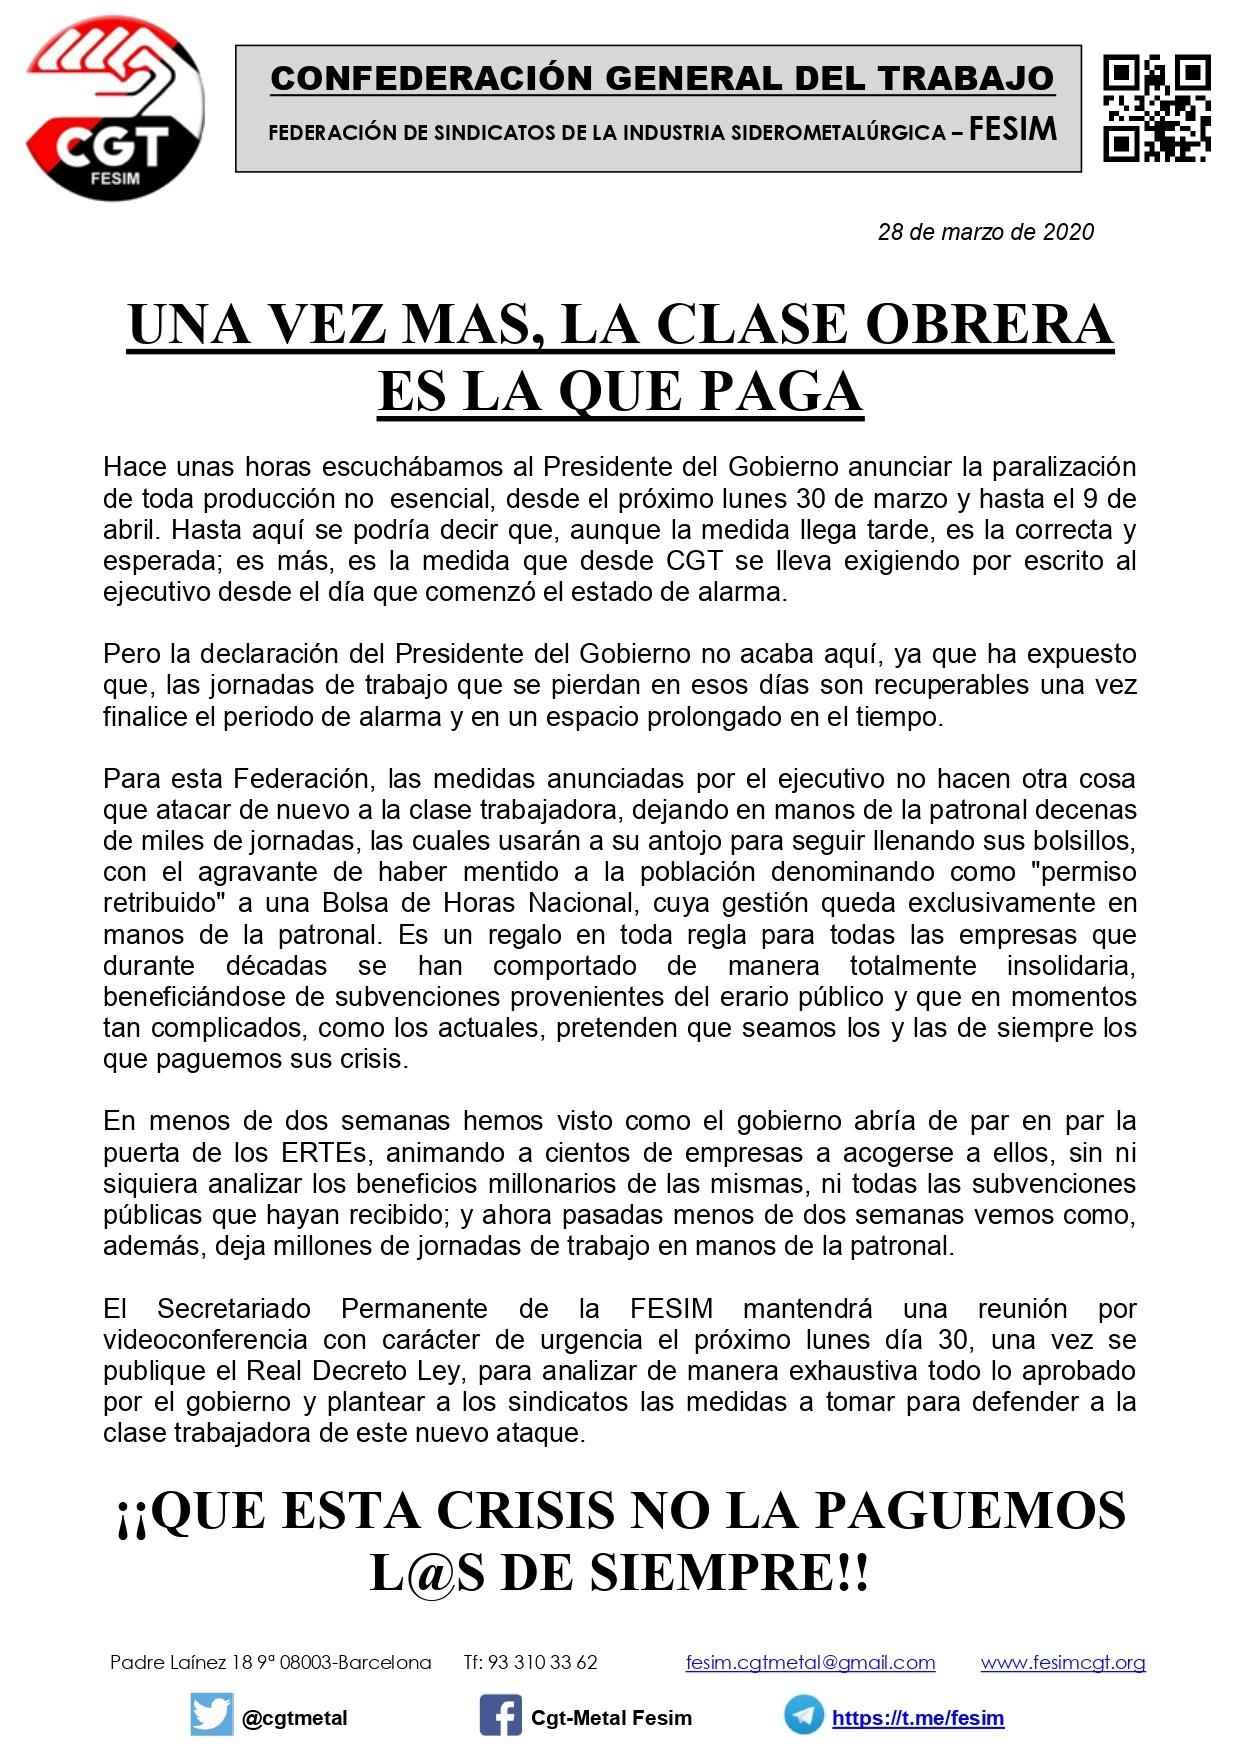 comunicado FESIM 280320 (COVID-19)_page-0001(1)